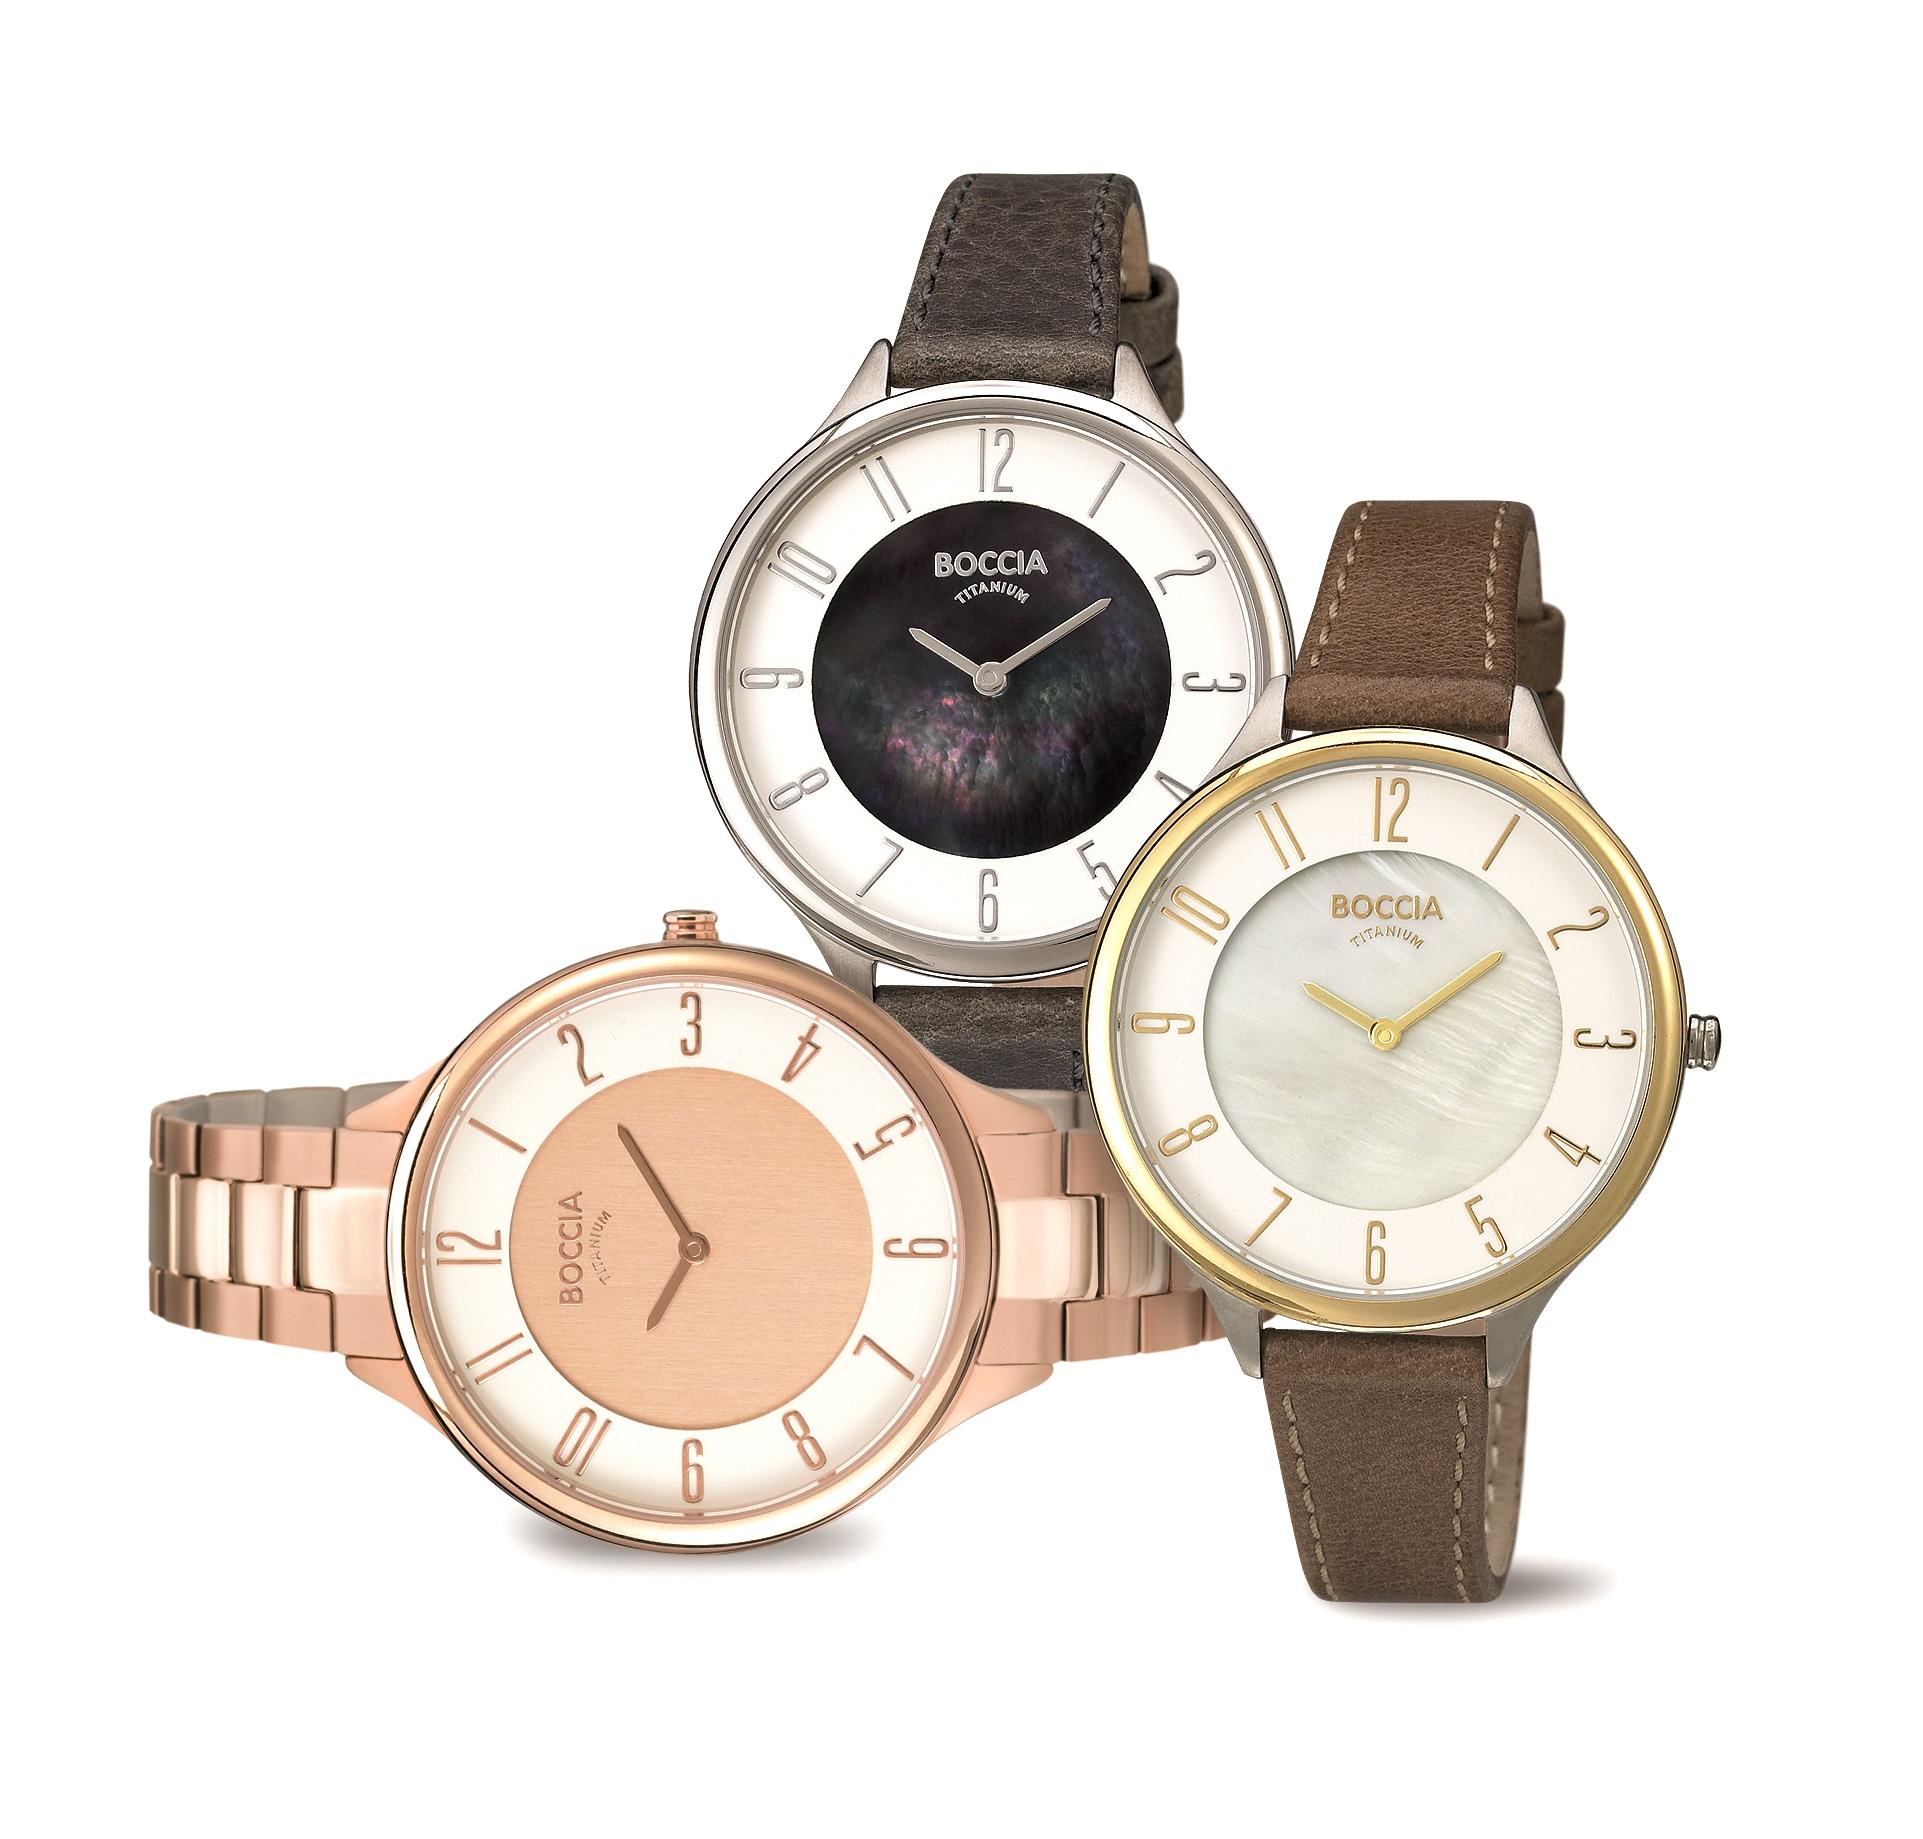 Boccia Uhren Ceramic Titan Weißmann Juwelier Online Shop kaufen Oberaudorf Armbanduhr